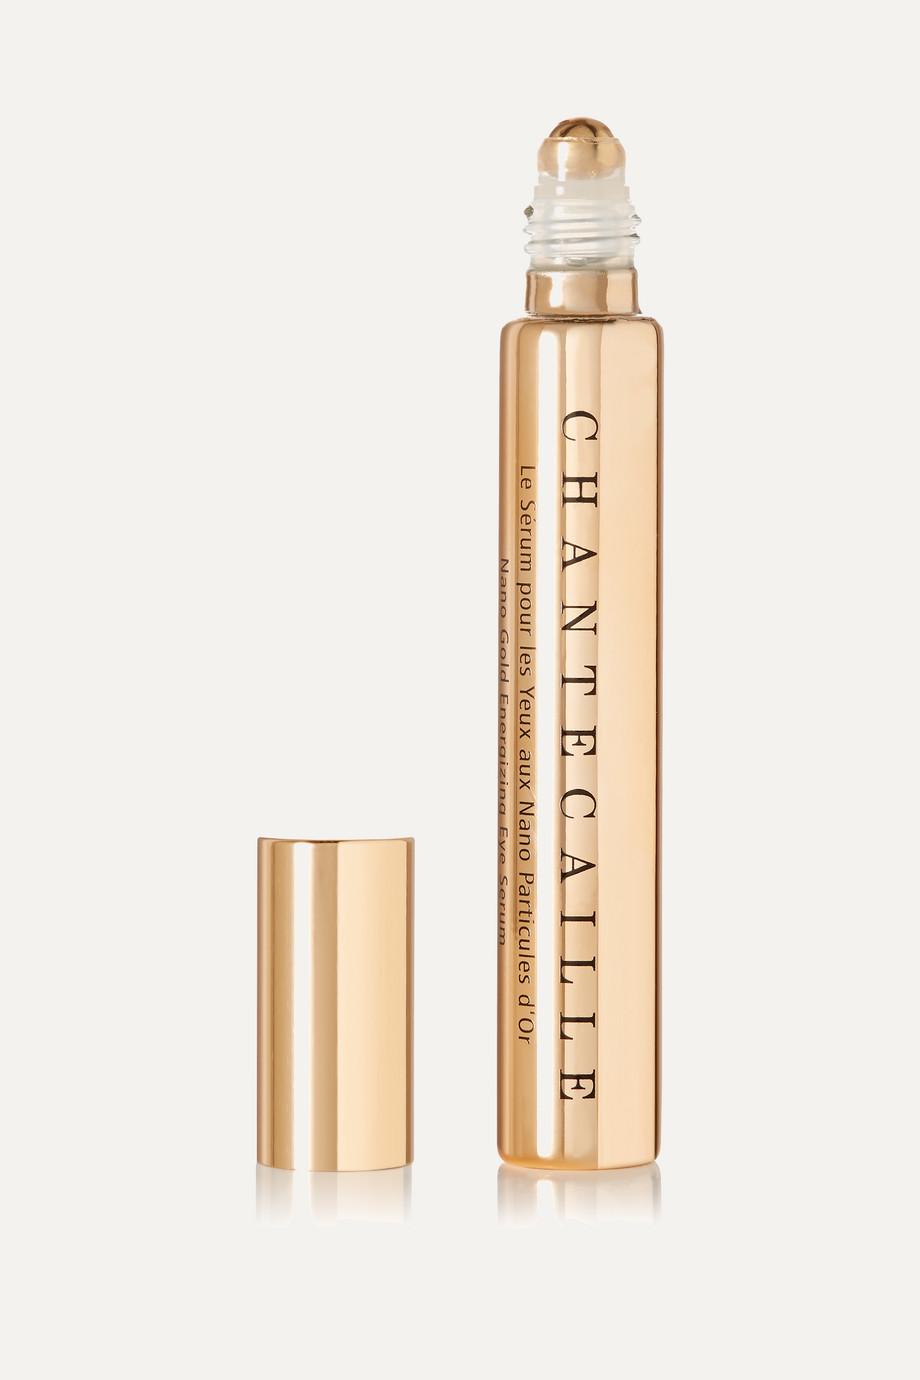 Chantecaille Nano Gold Energizing Eye Serum, 15ml